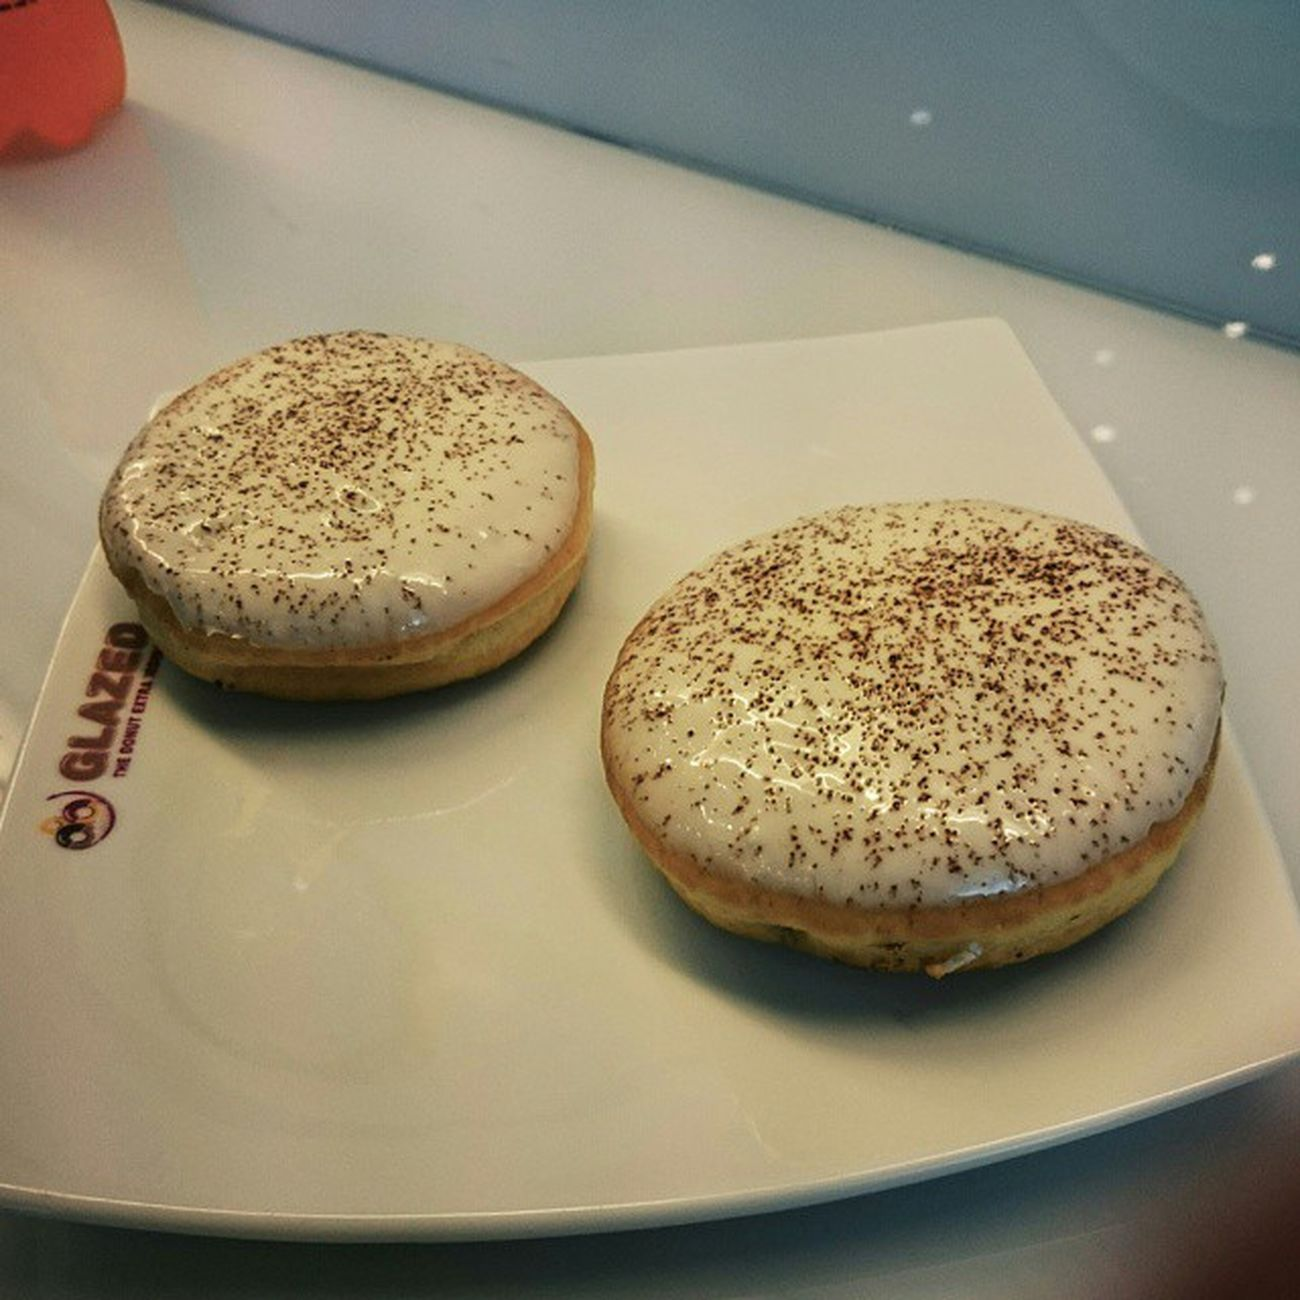 🍩 Tiramisu. 😁 Donut Food Dhaka